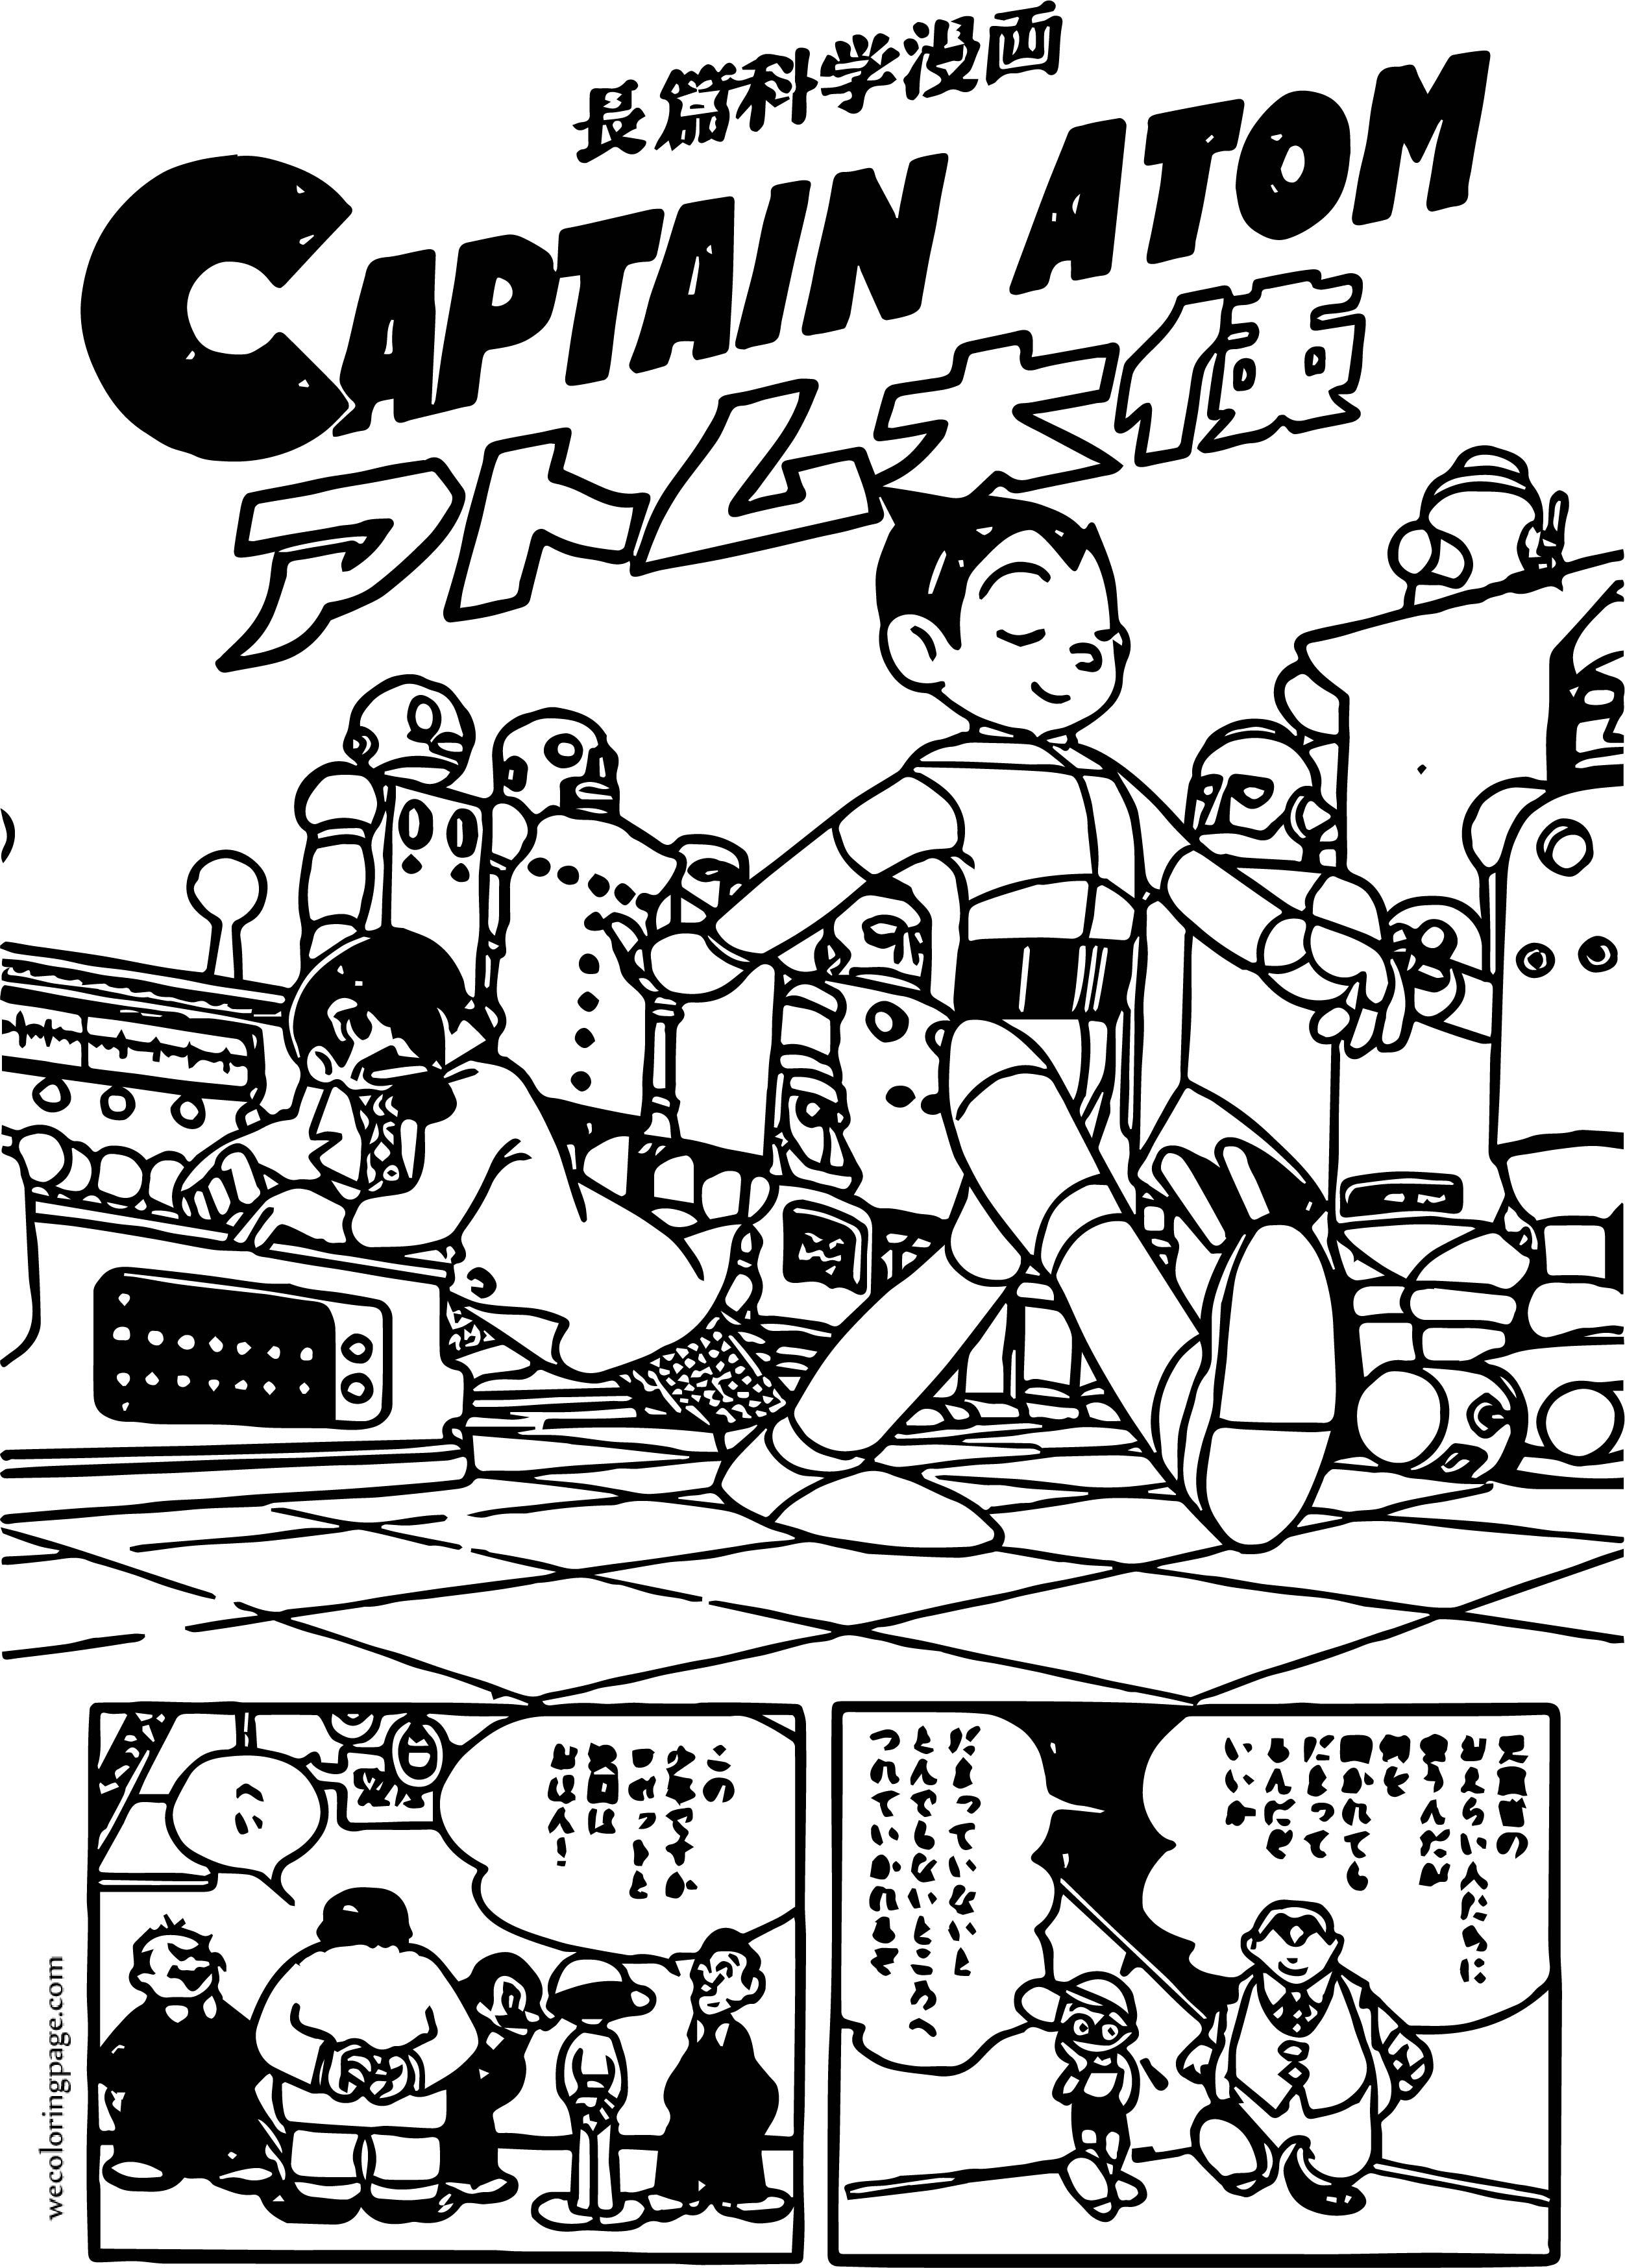 Astroboy Manga Captain Atom Coloring Page